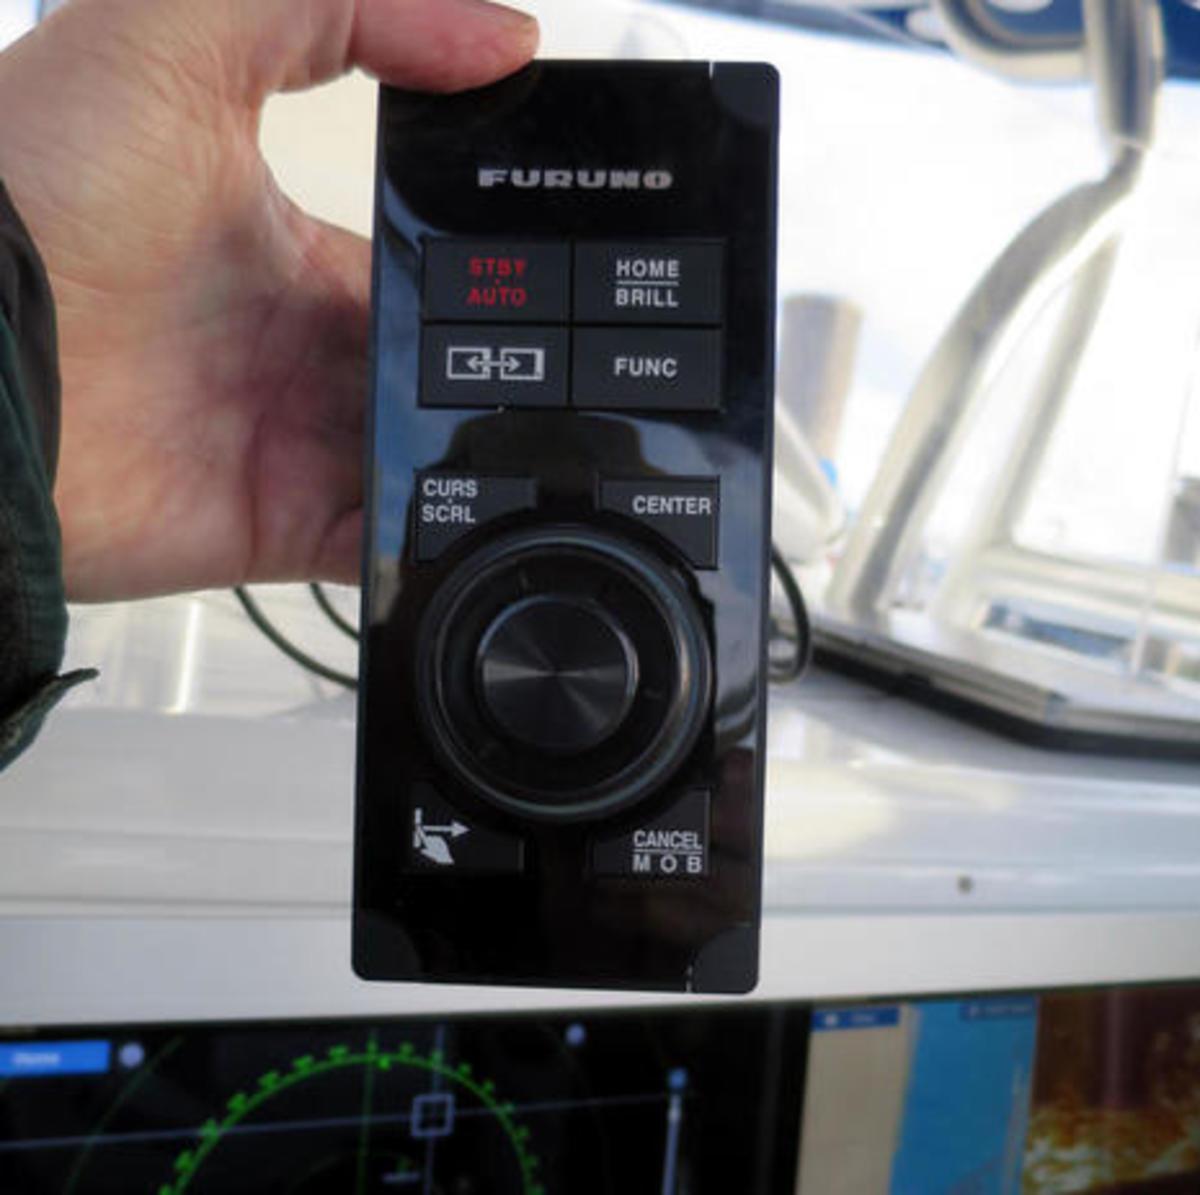 Furuno MCU004 remote TZTouch keypad